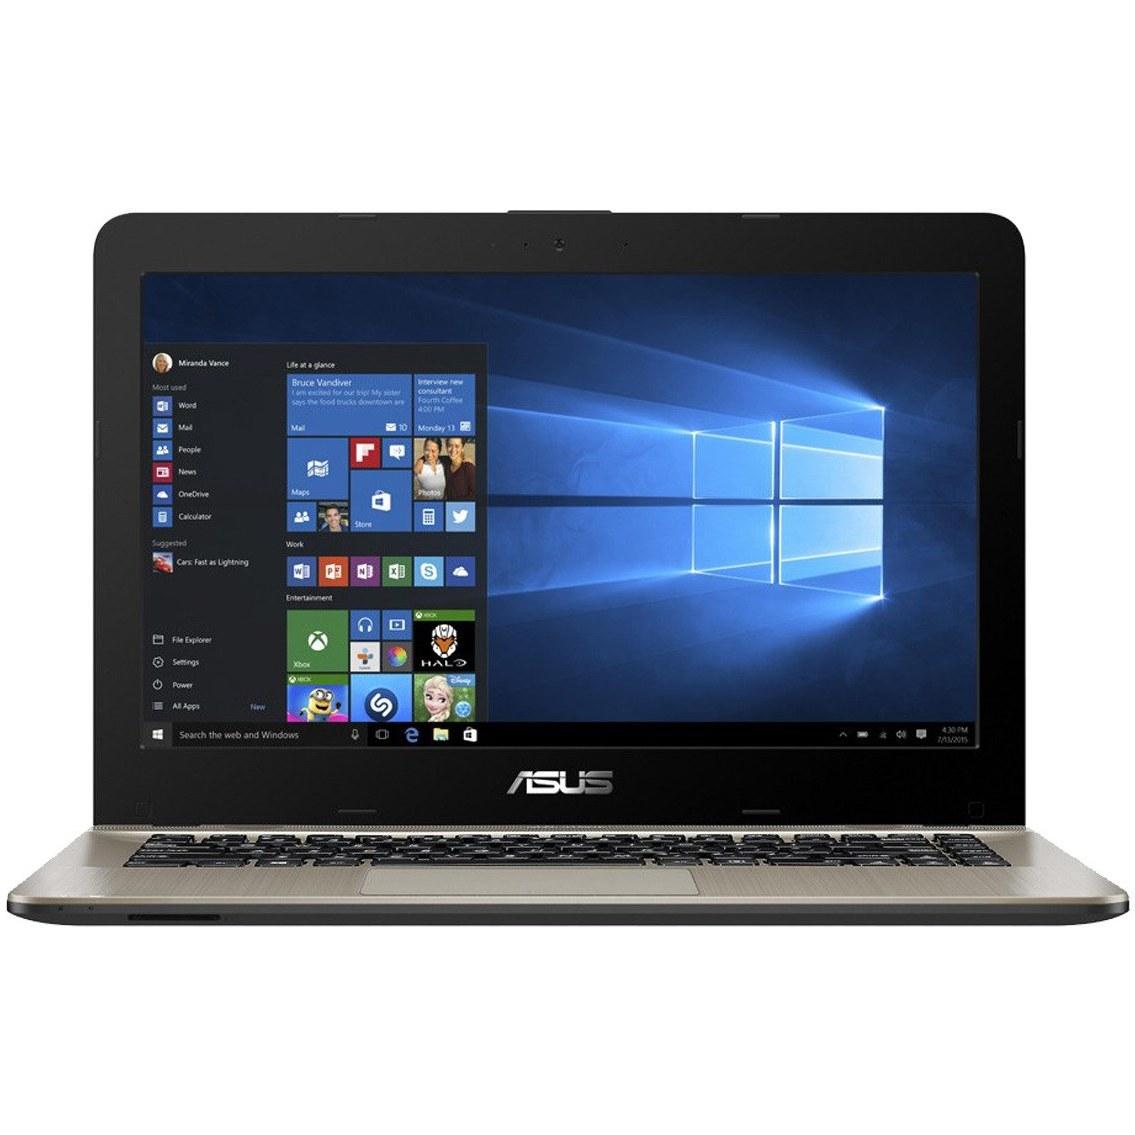 لپ تاپ ایسوس  ASUS X441UV Core i7 12GB 2TB 2GB Full HD Laptop